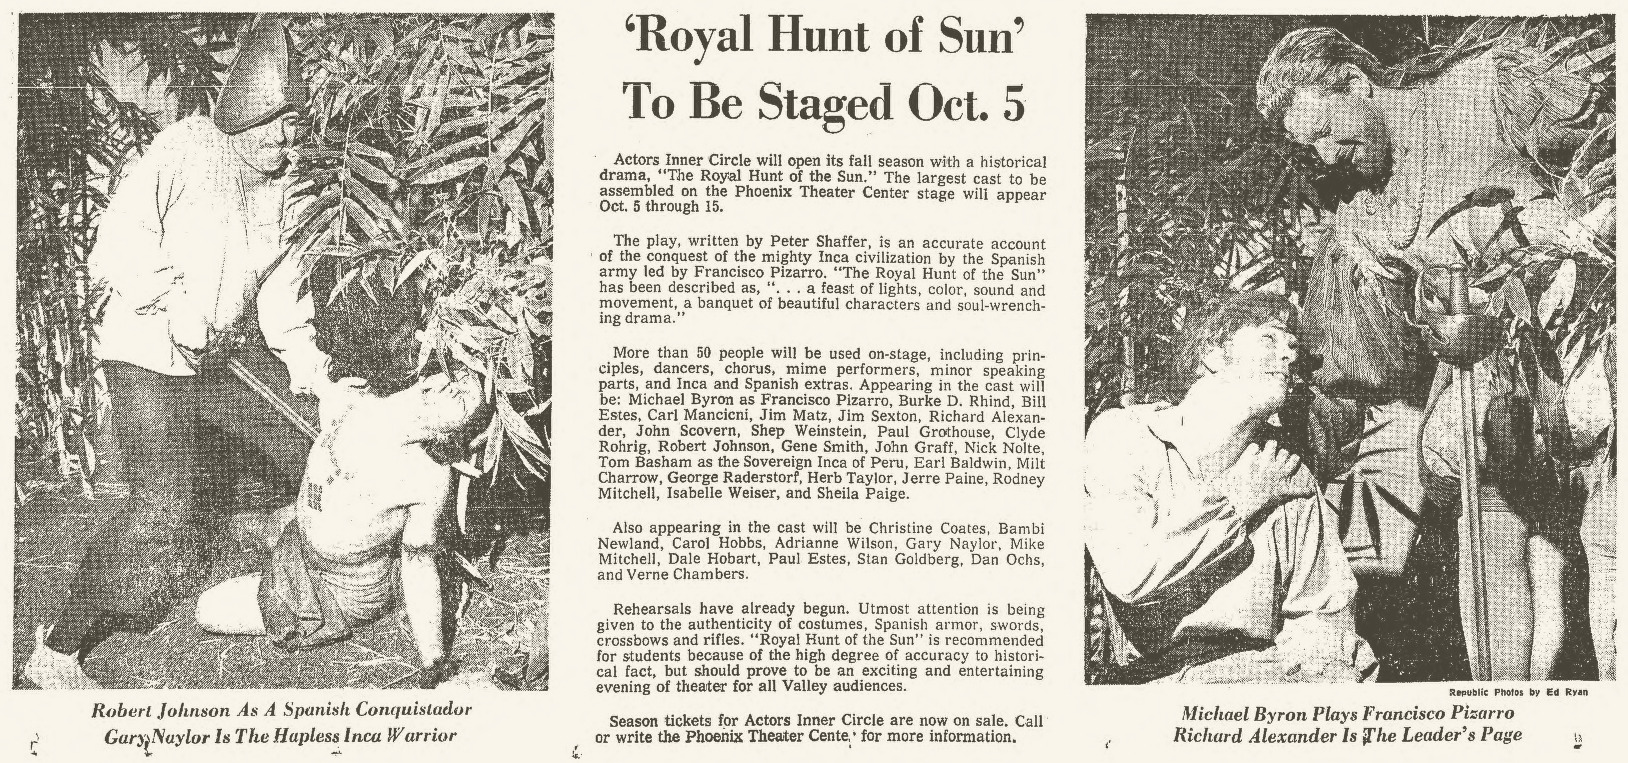 Arizona Republic, Sept. 3, 1967